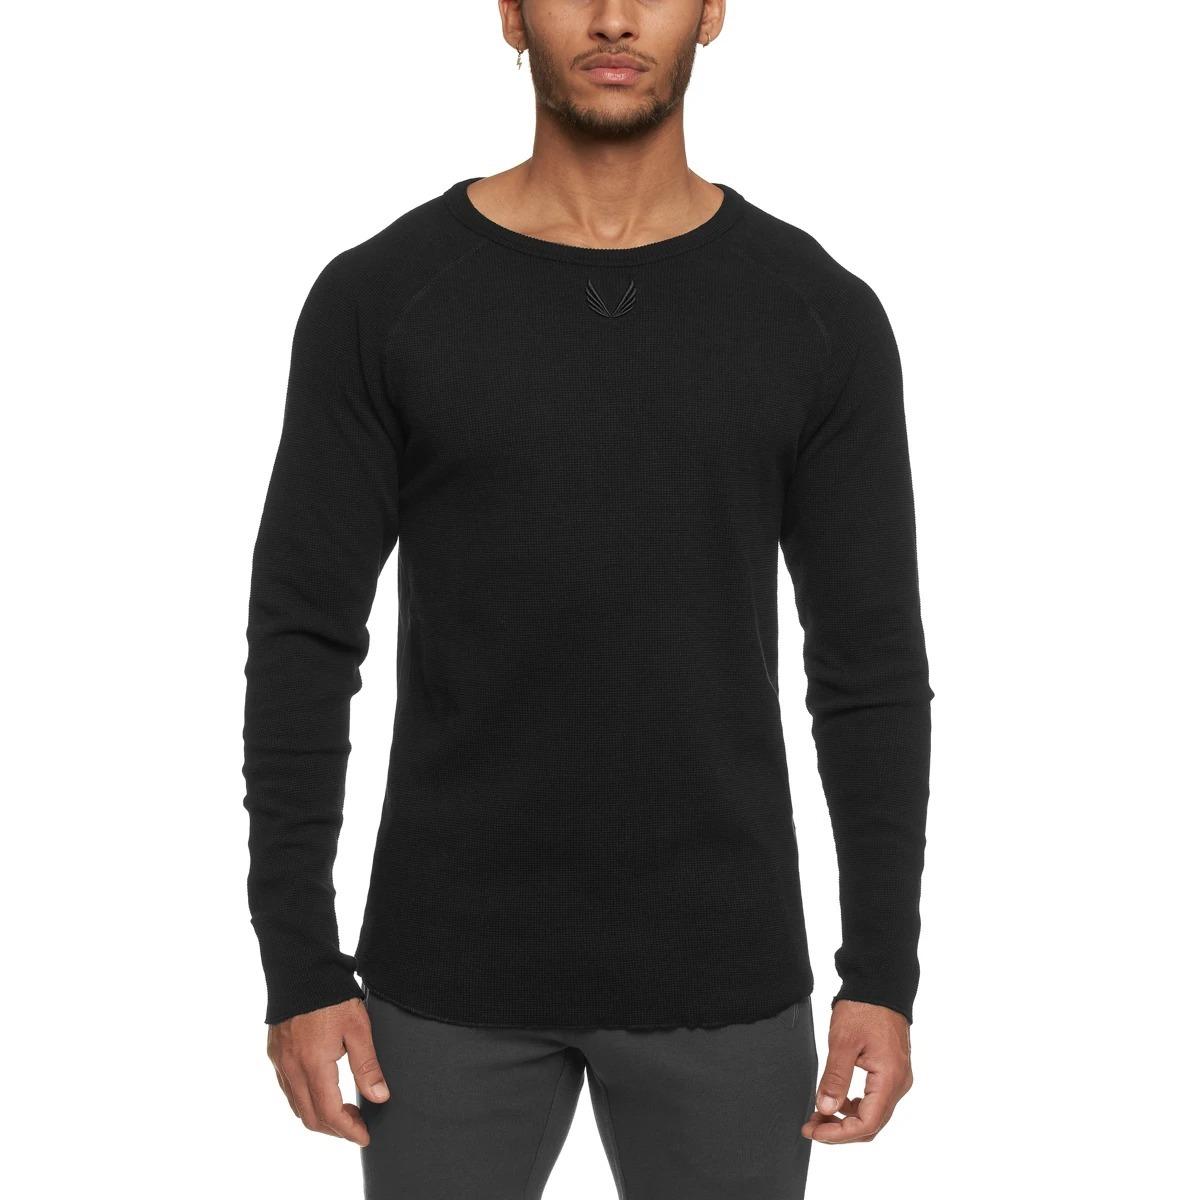 【ASRV】SilverPlus® メッシュバックロングシャツ - Black